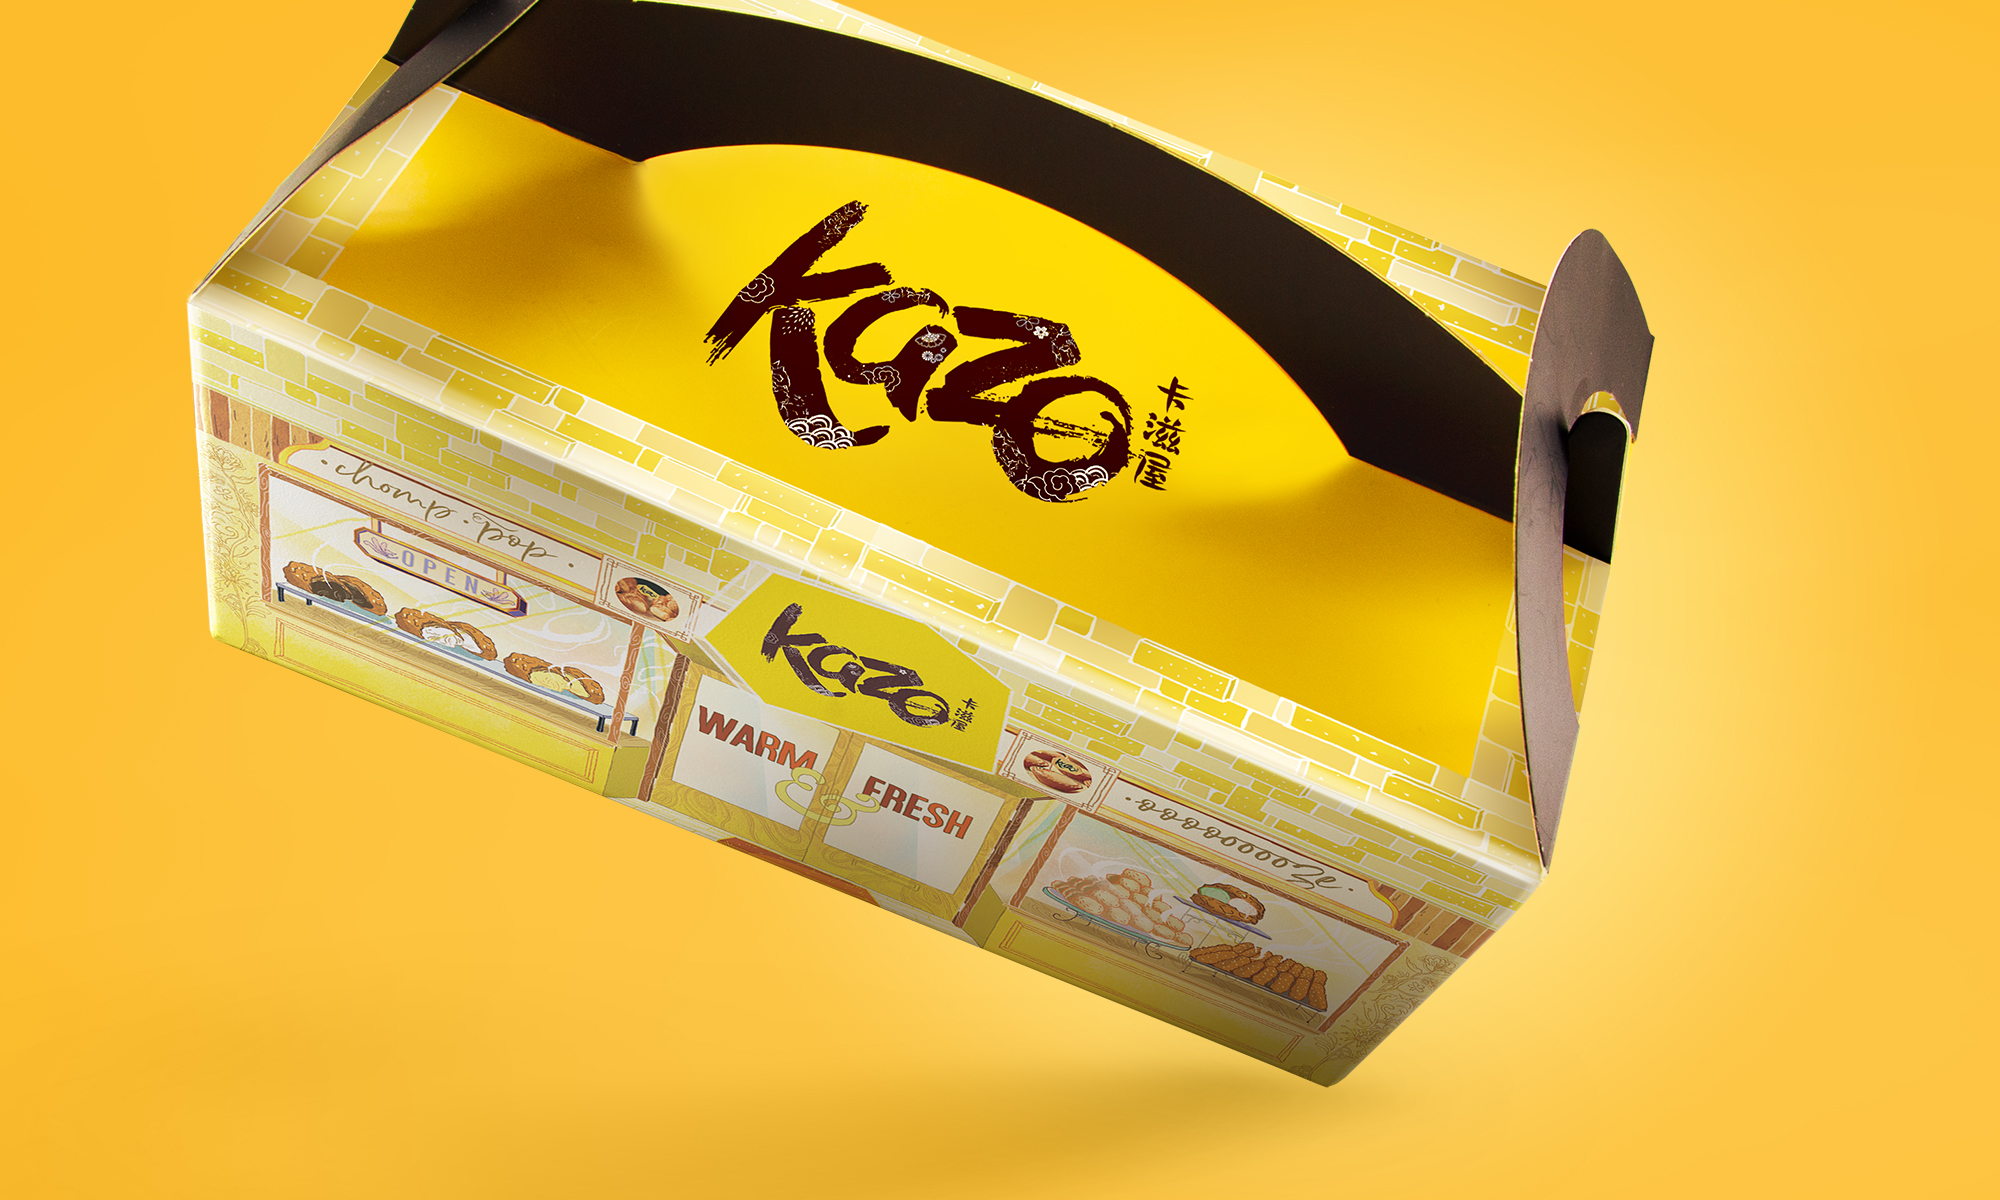 kazo-singapore-puffs-packaging-top.jpg